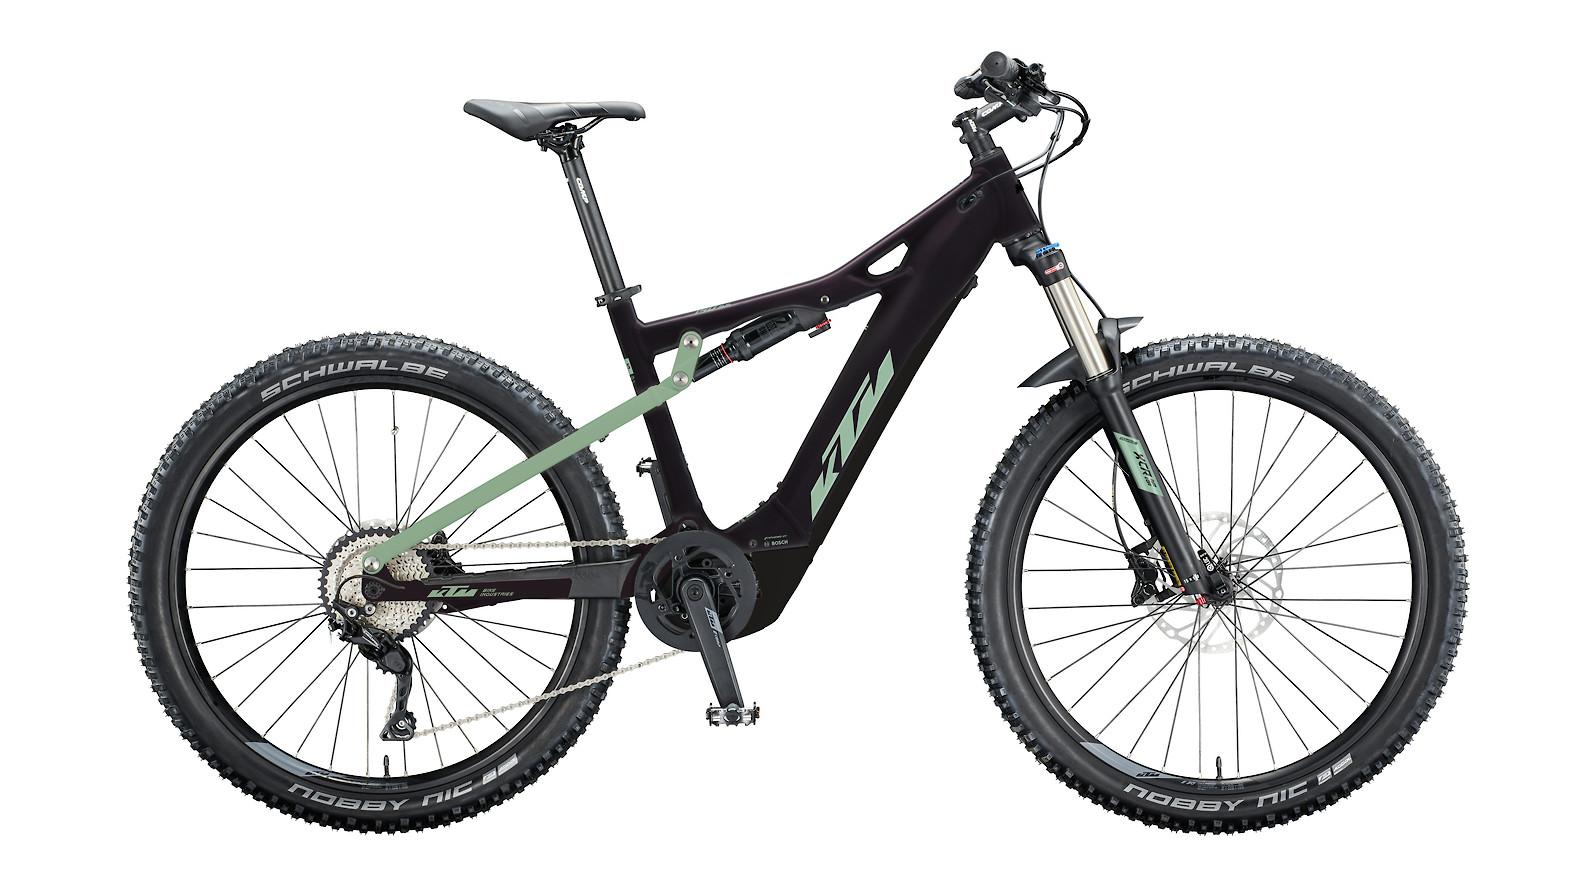 electric mountain bike 2019 KTM Macina Ride 272 Bosch eMTB Price Reduced